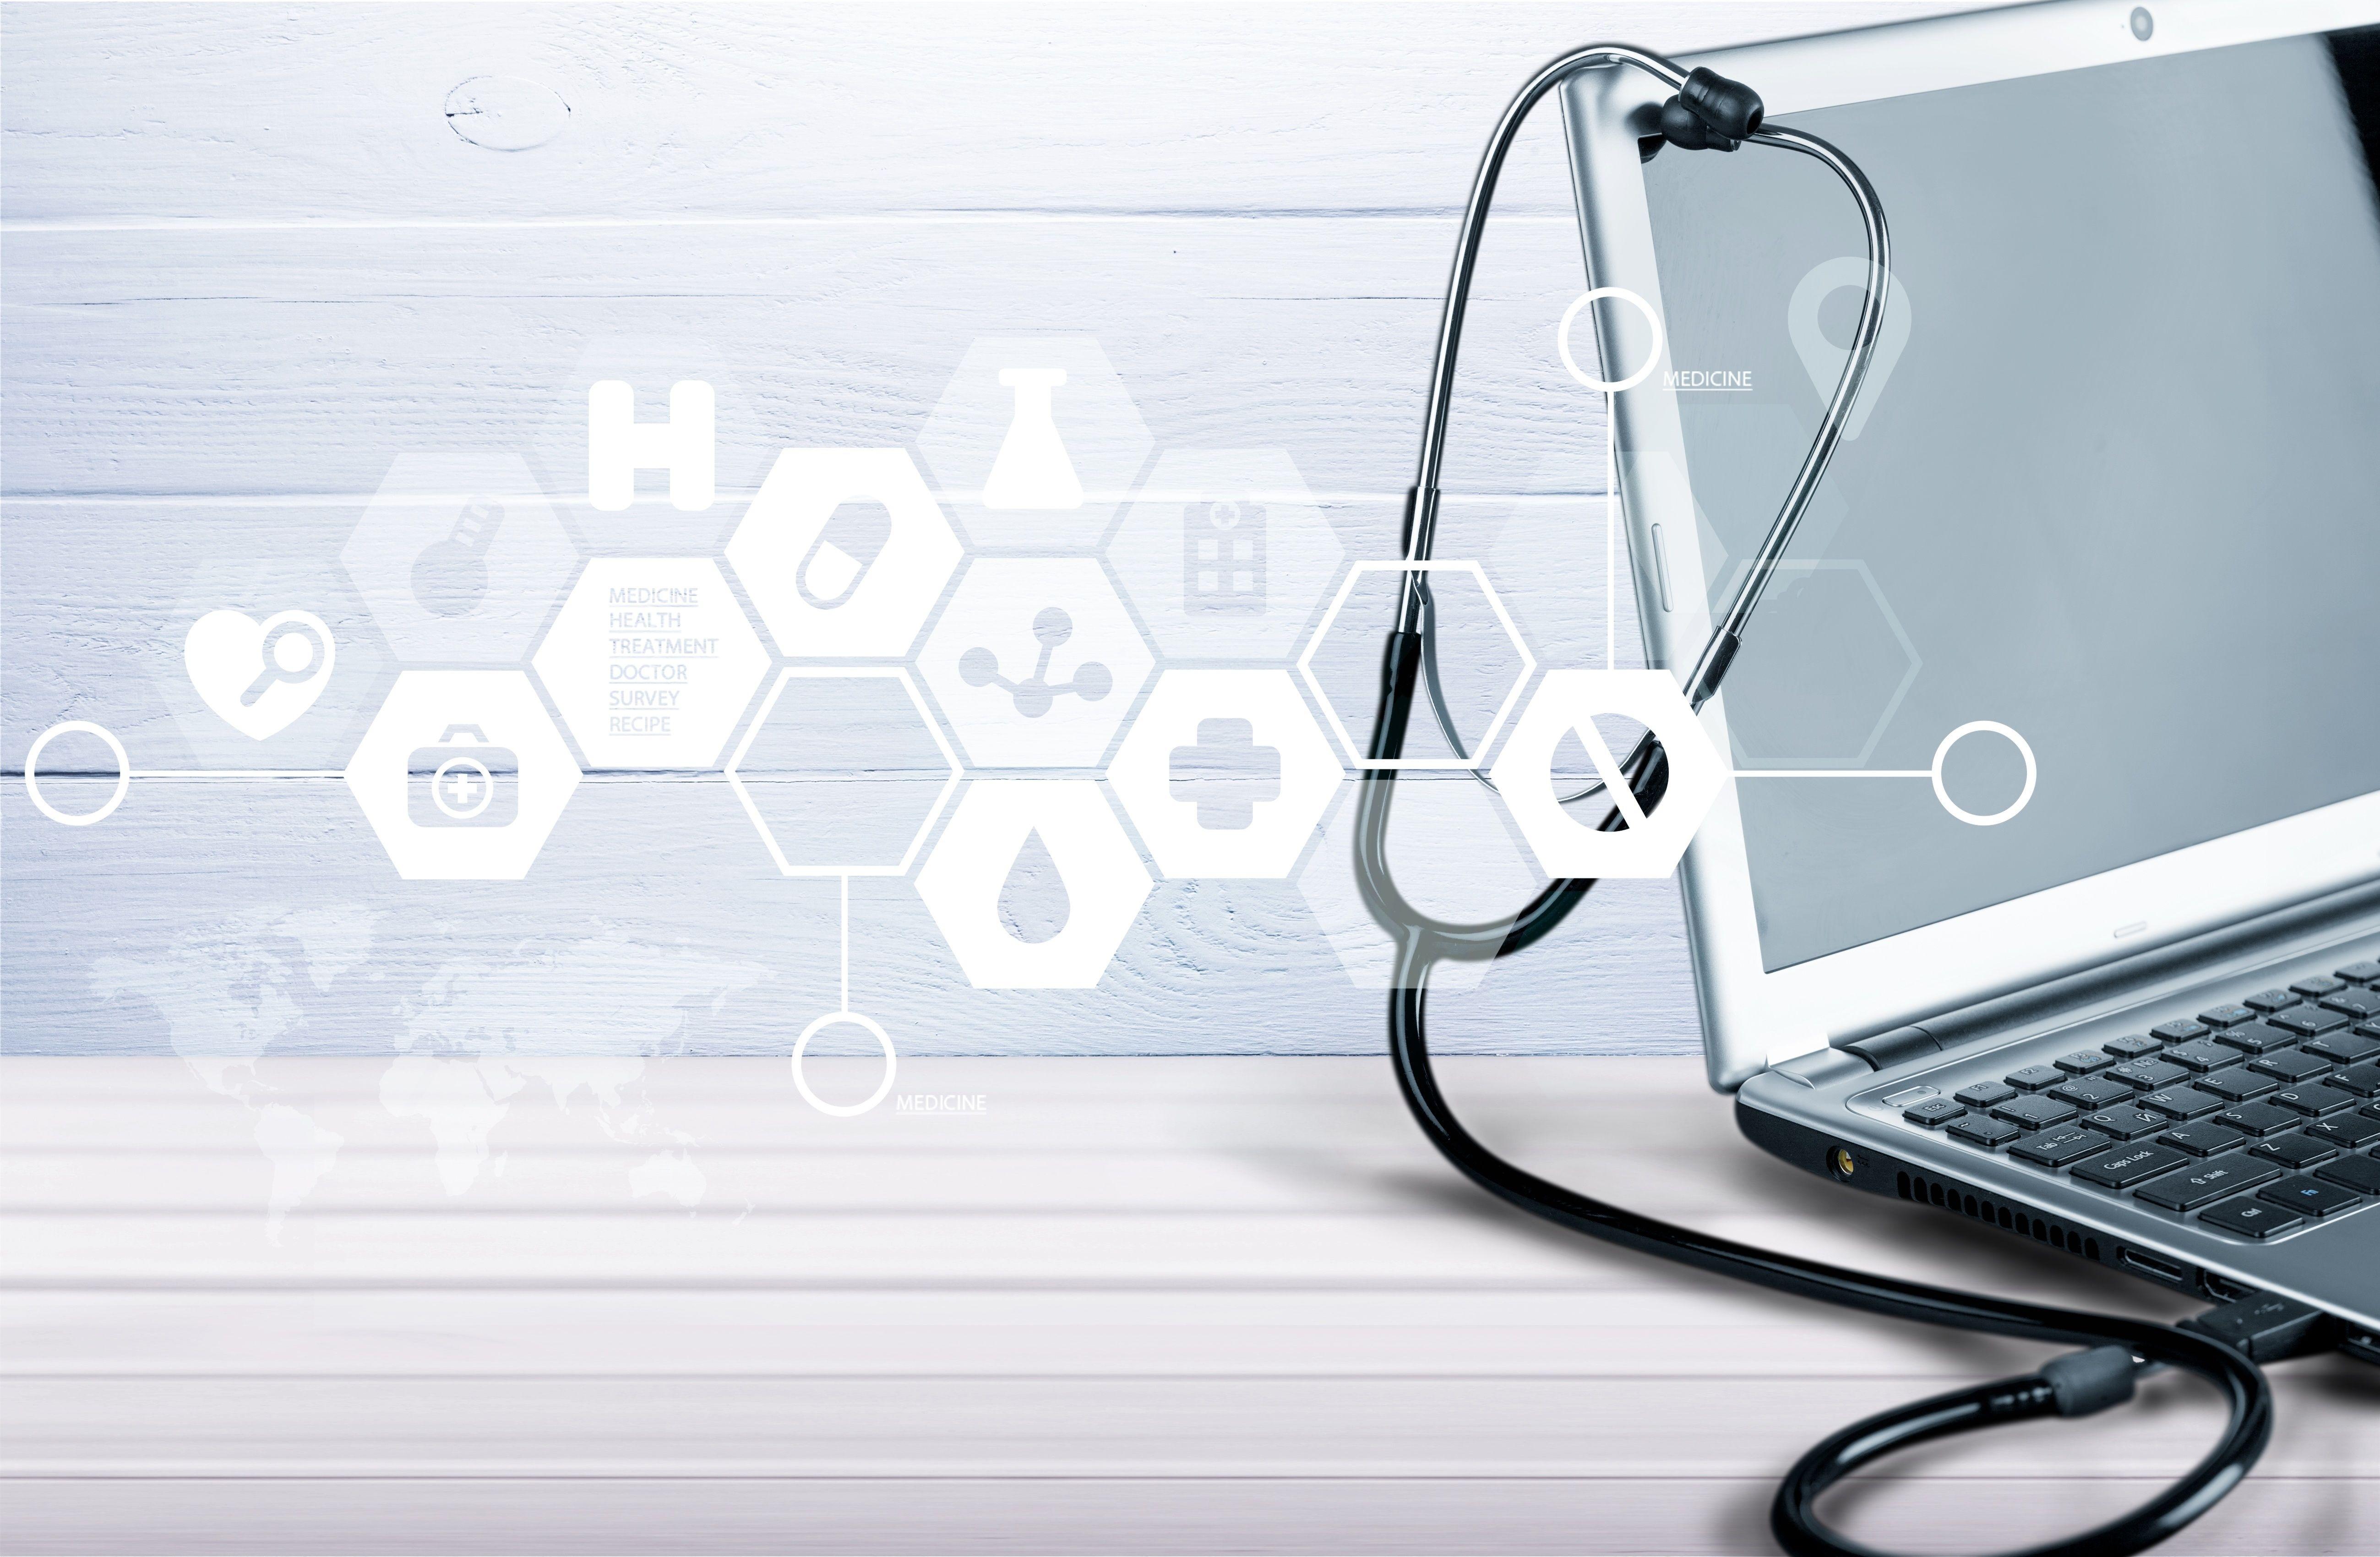 E/M changes take effect January 2021 | Medical Economics